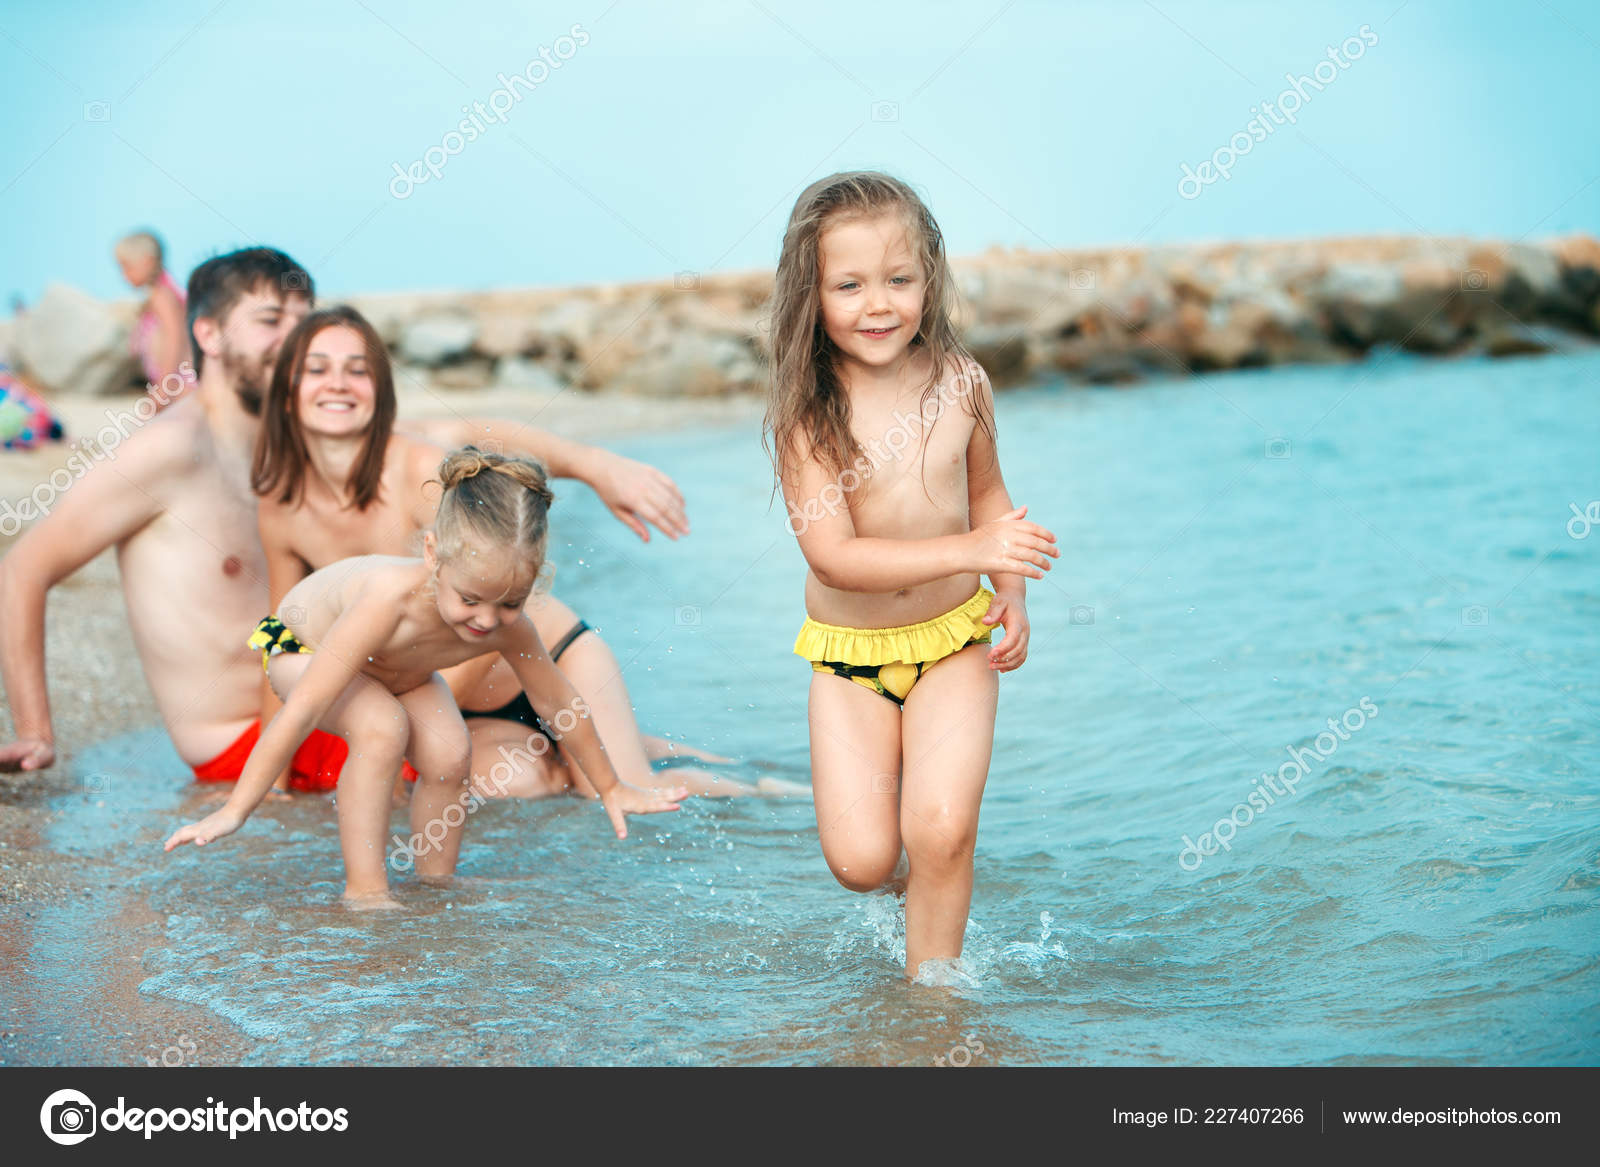 https://st4.depositphotos.com/3917667/22740/i/1600/depositphotos_227407266-stock-photo-happy-family-enjoying-walk-on.jpg